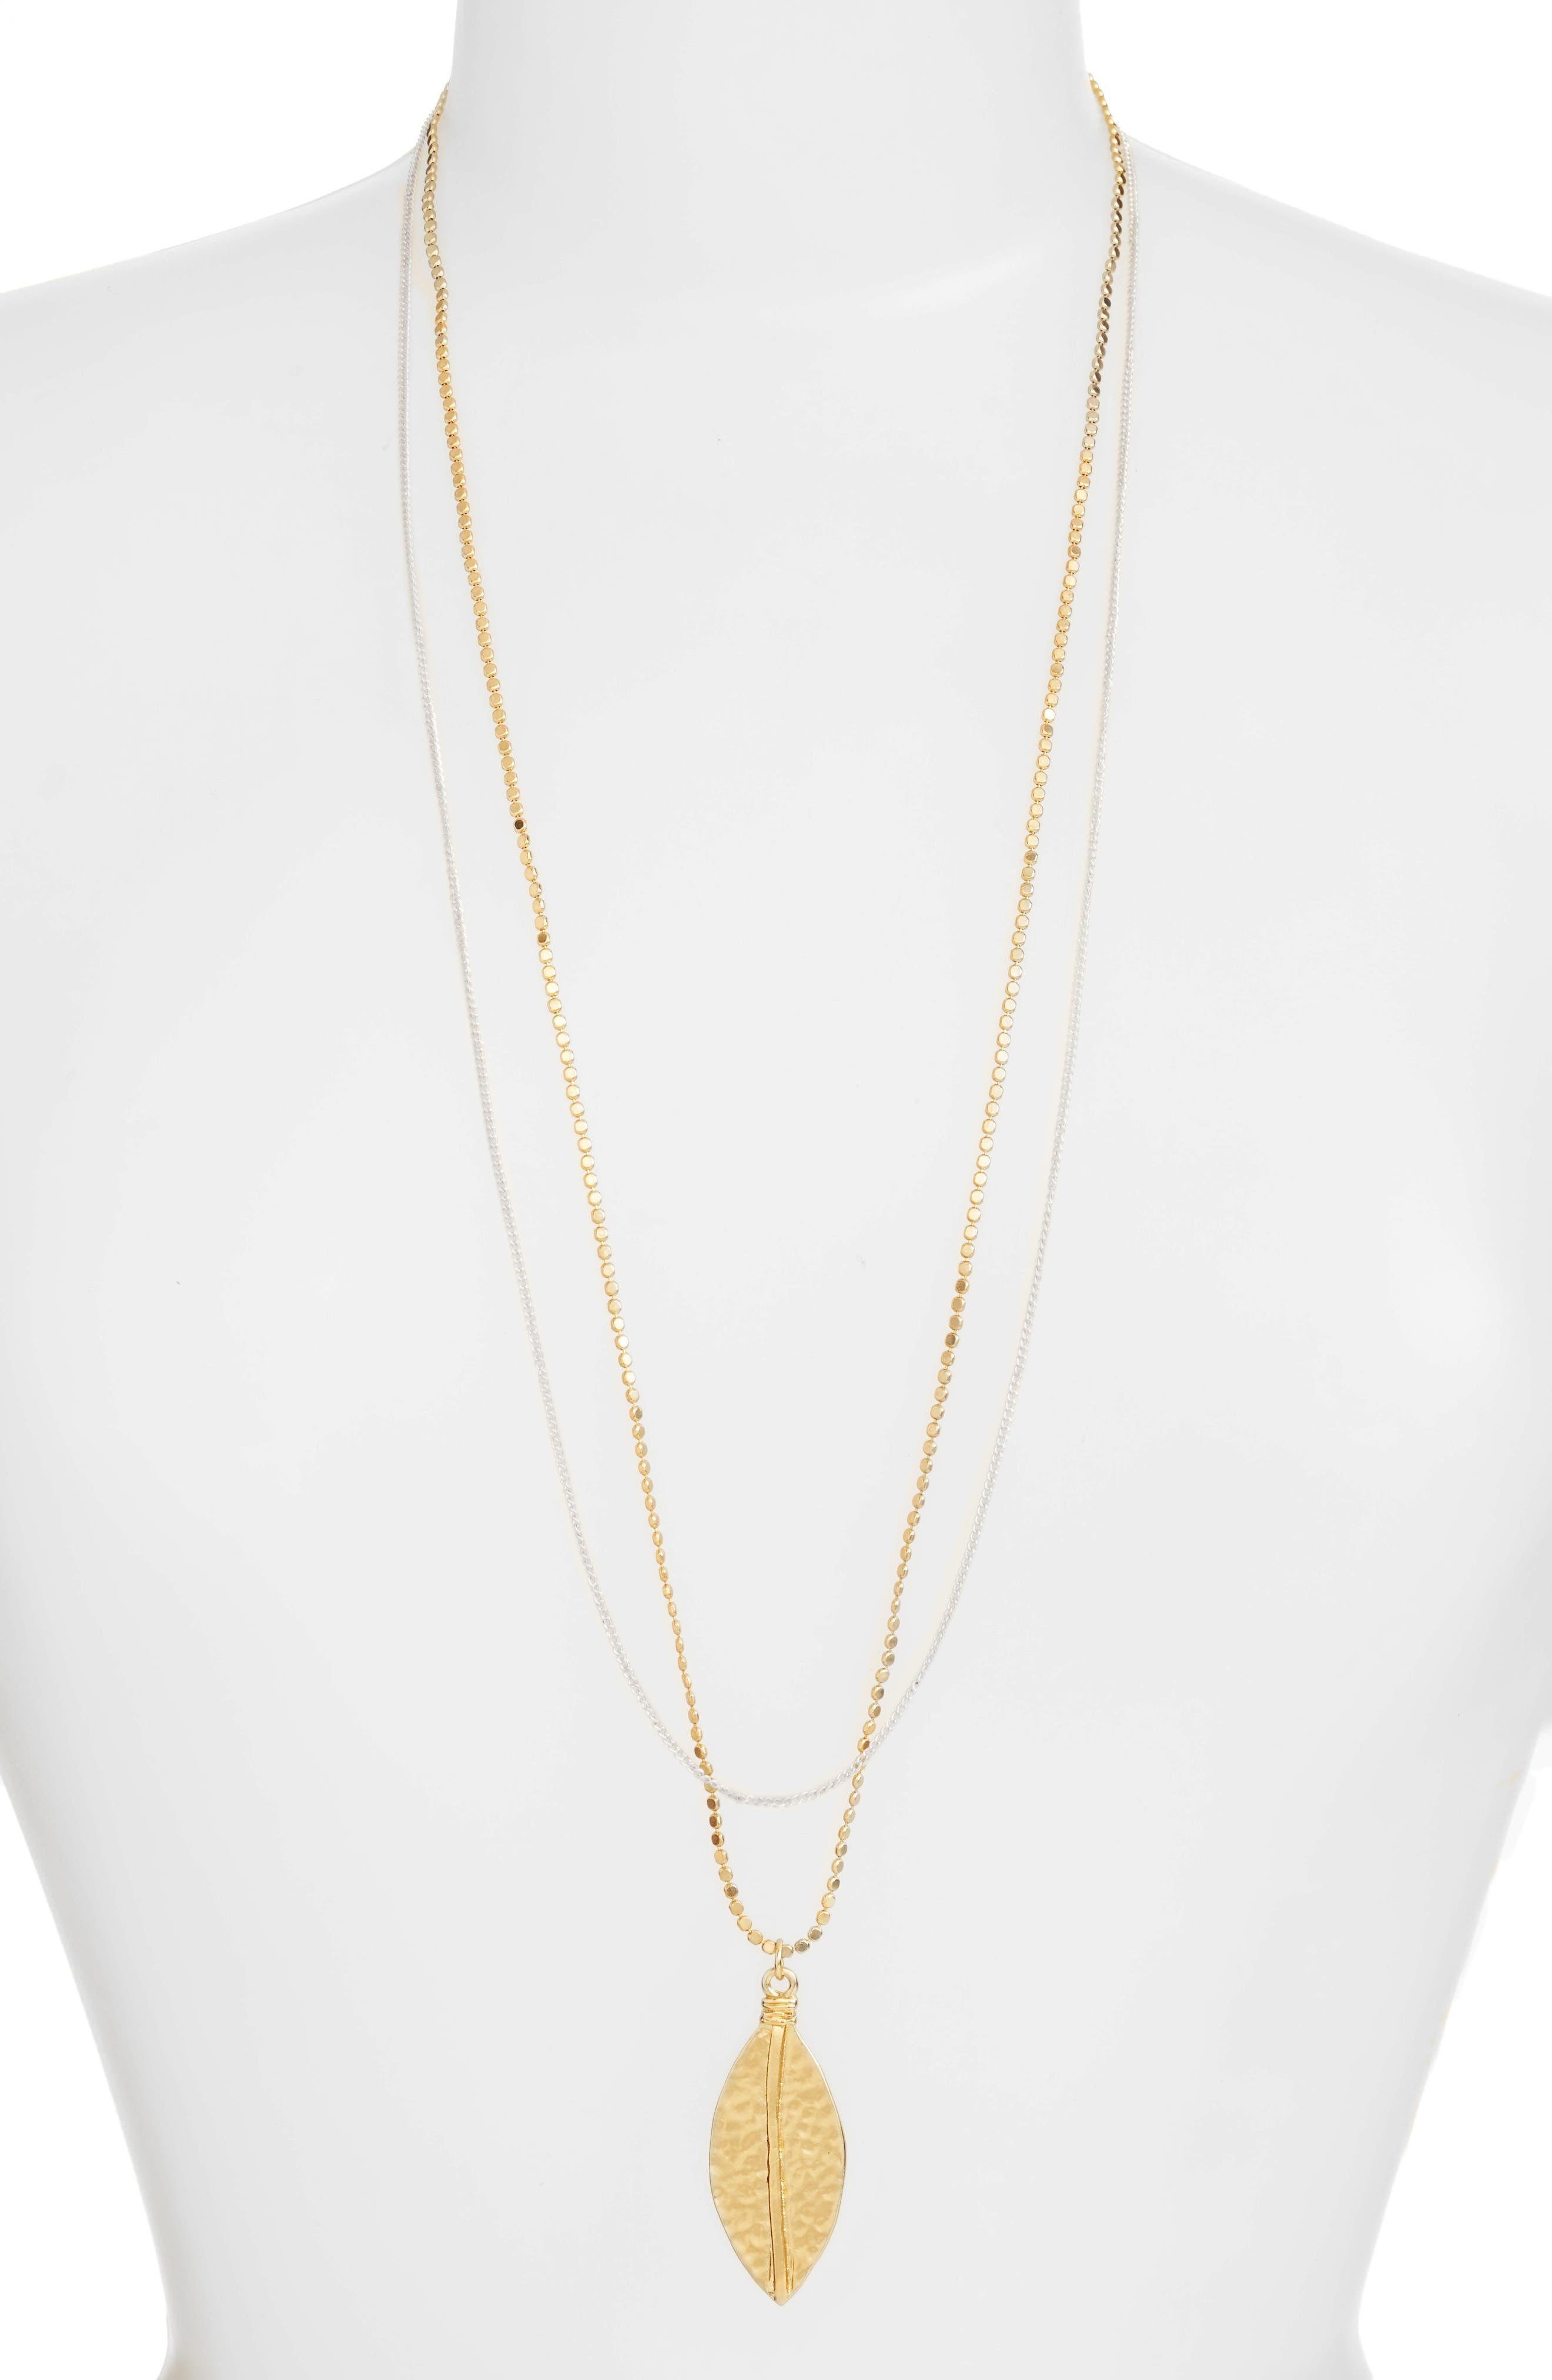 Karine Sultan Long Multistrand Necklace